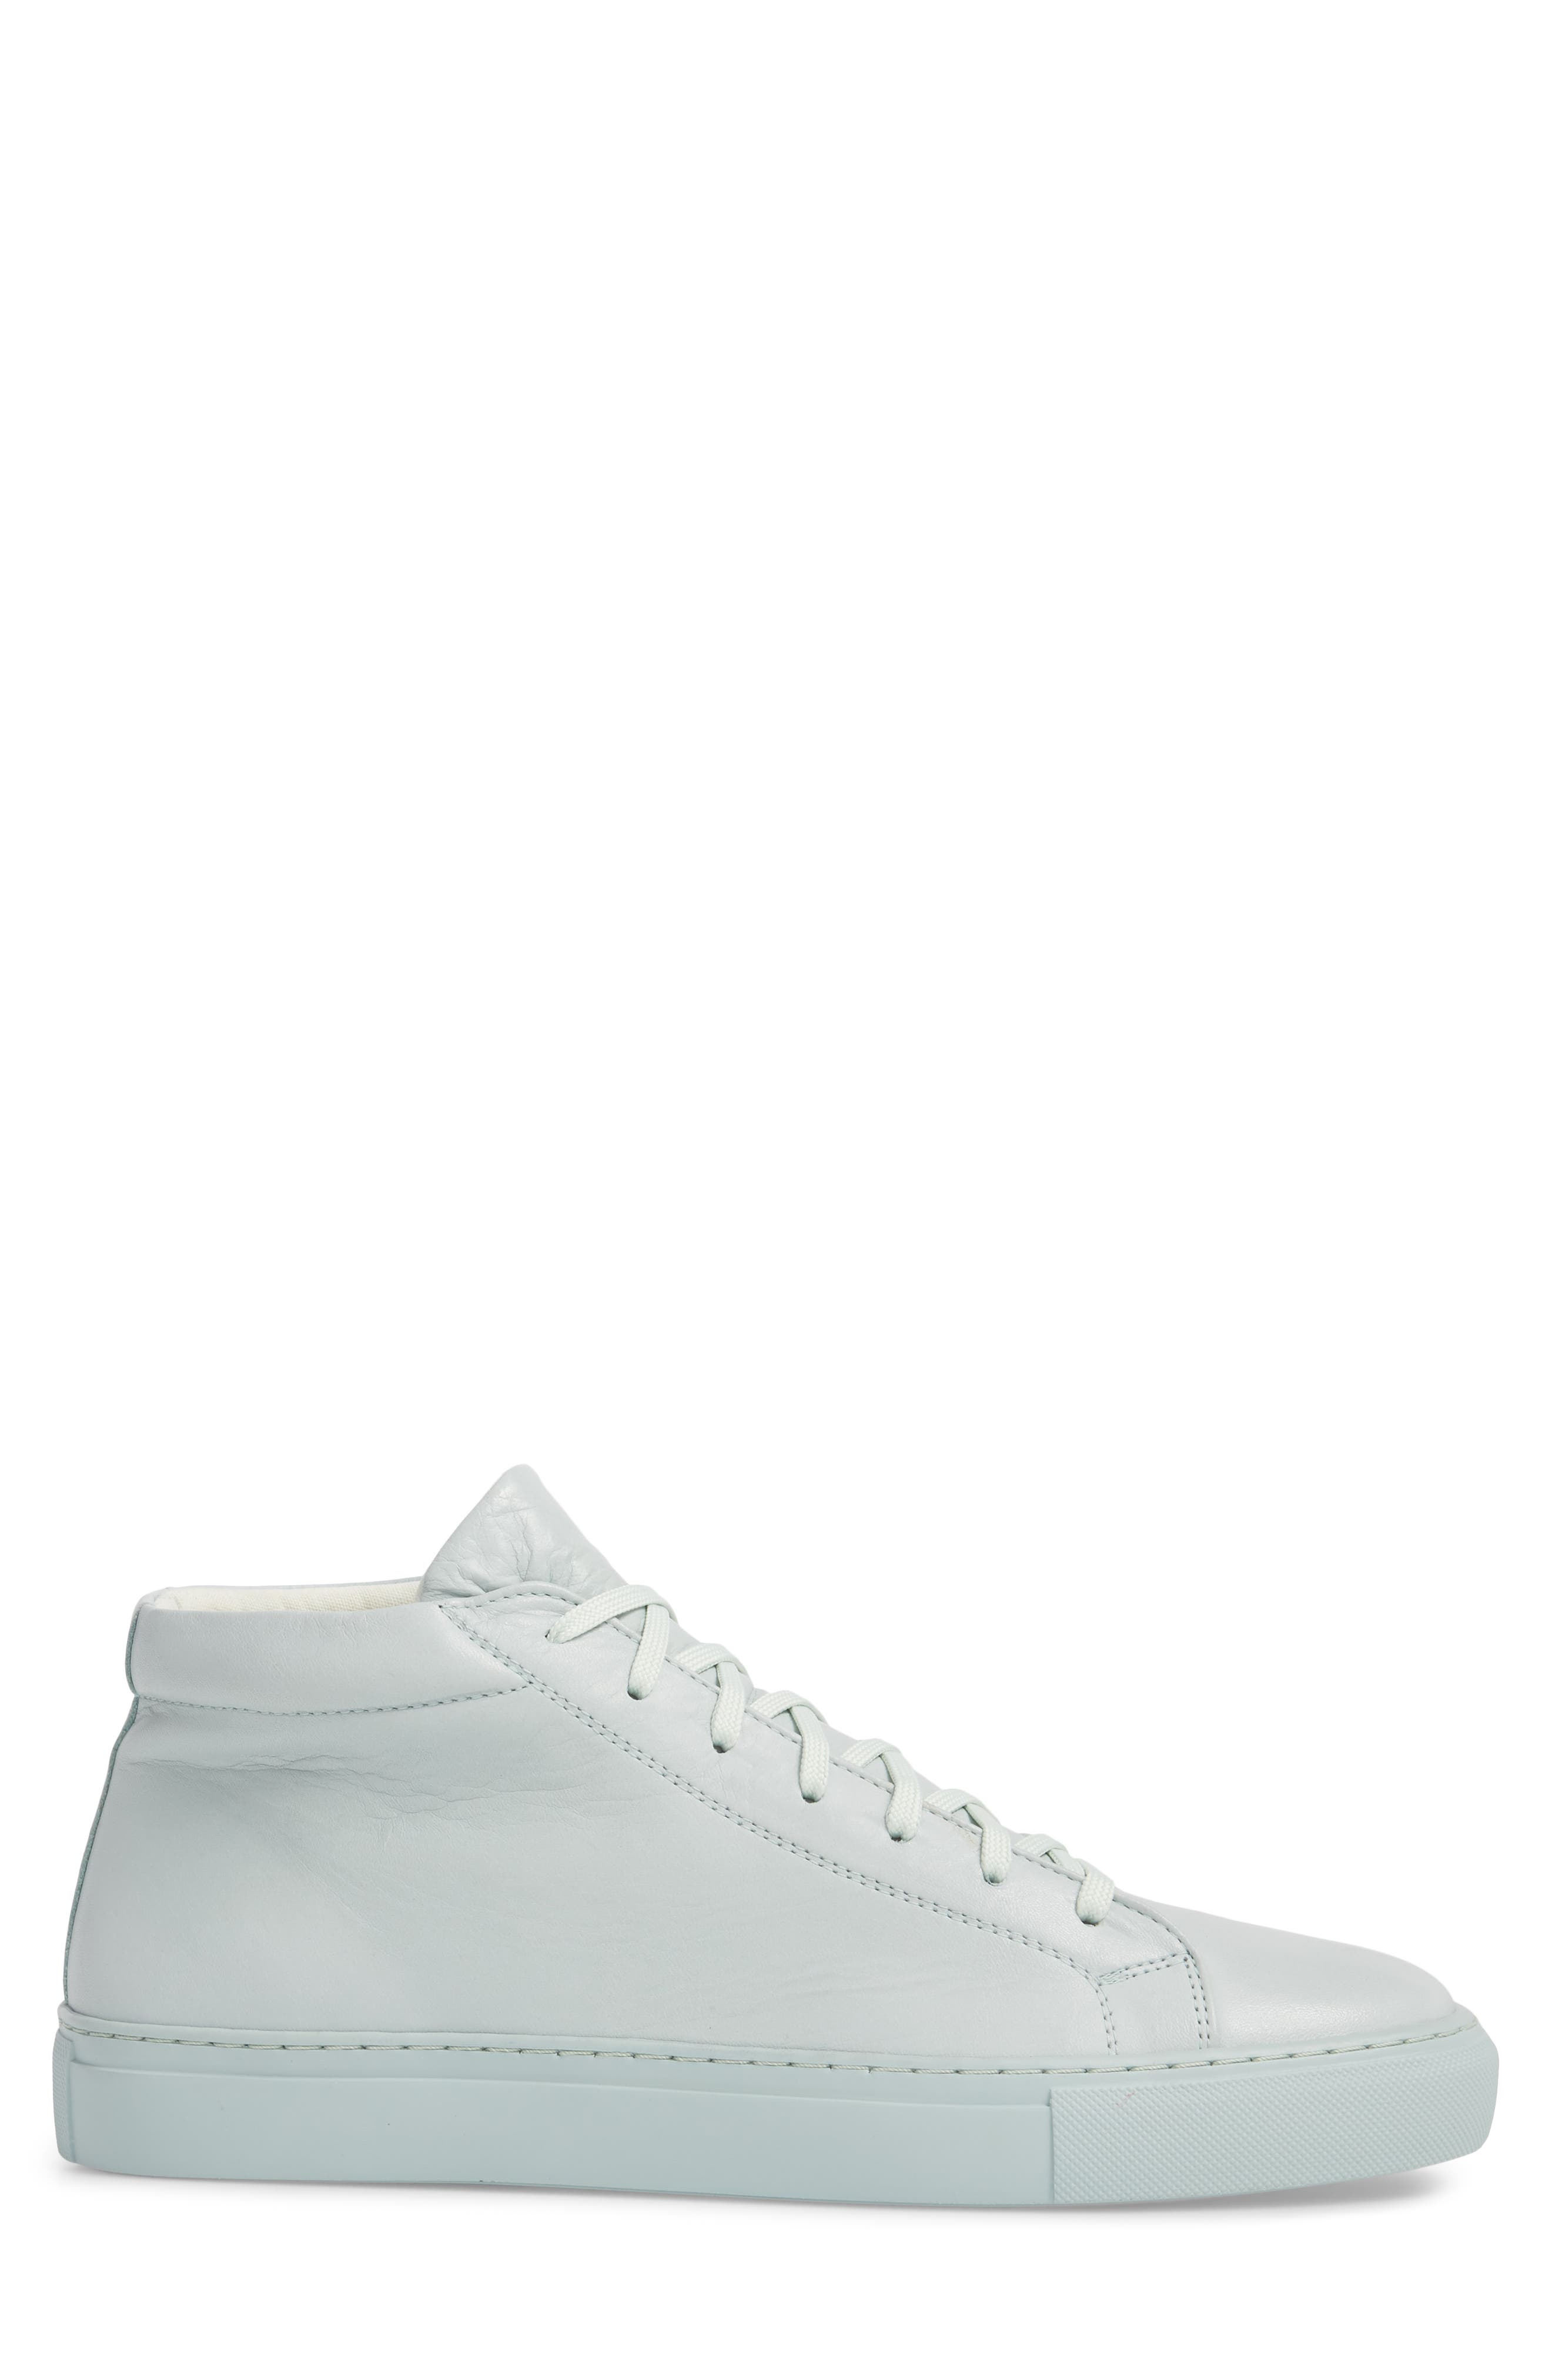 Lexington Mid Top Sneaker,                             Alternate thumbnail 7, color,